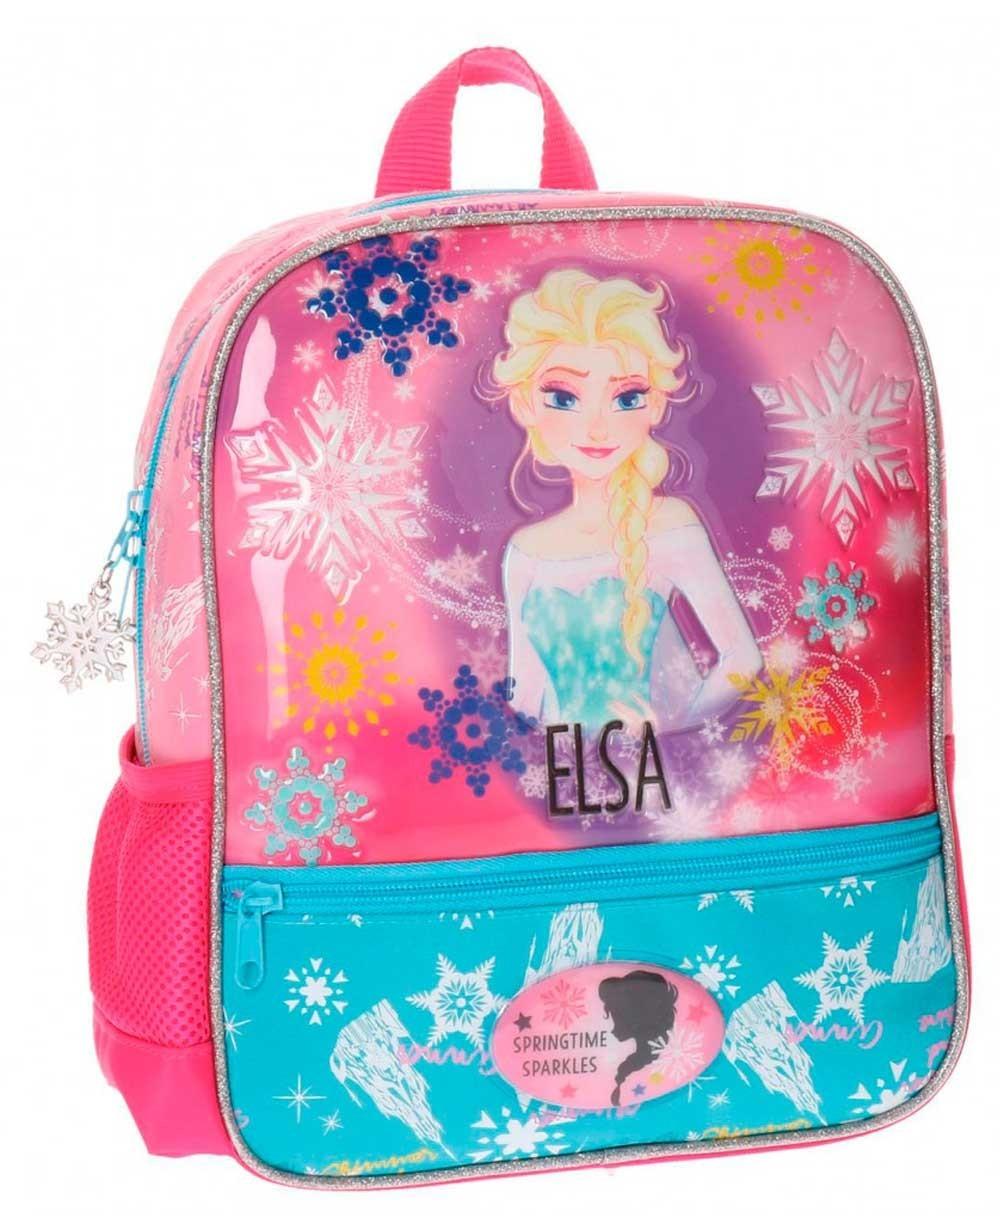 Frozen Elsa mochila preescolar Rosa (Foto )